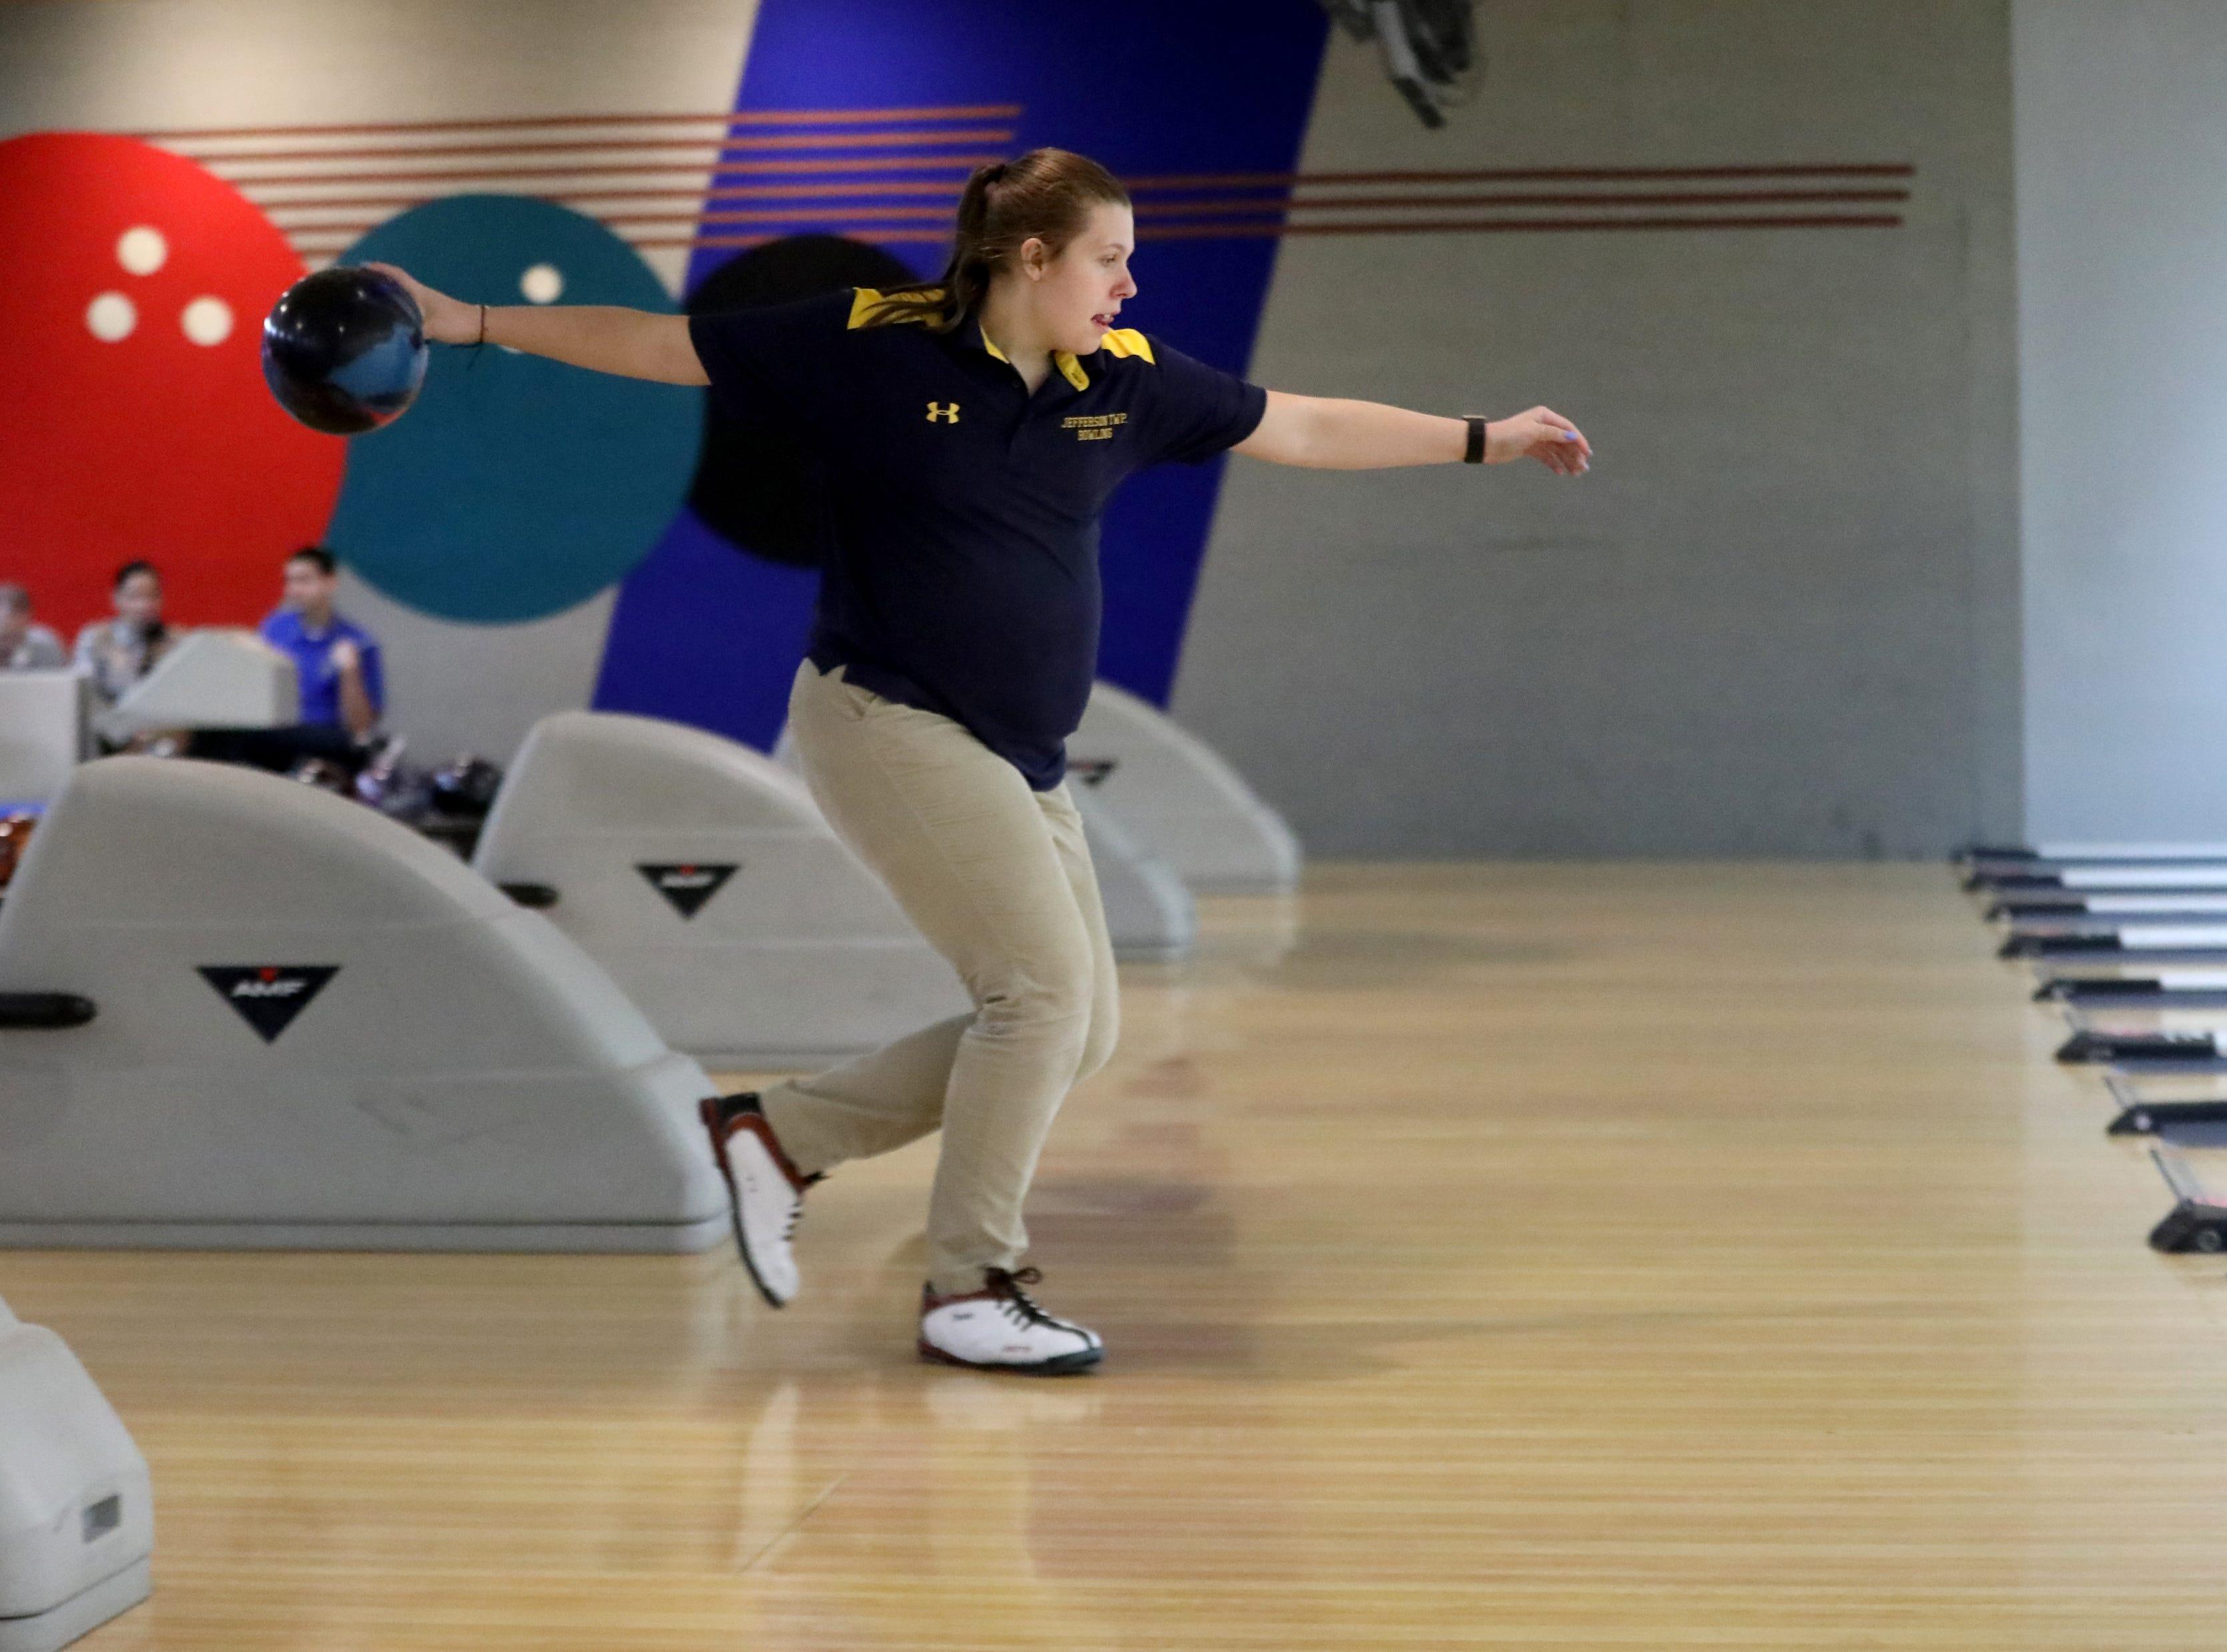 Jefferson senior Emma Thies bowls in the Morris County Tournament. Thursday, January 24, 2019